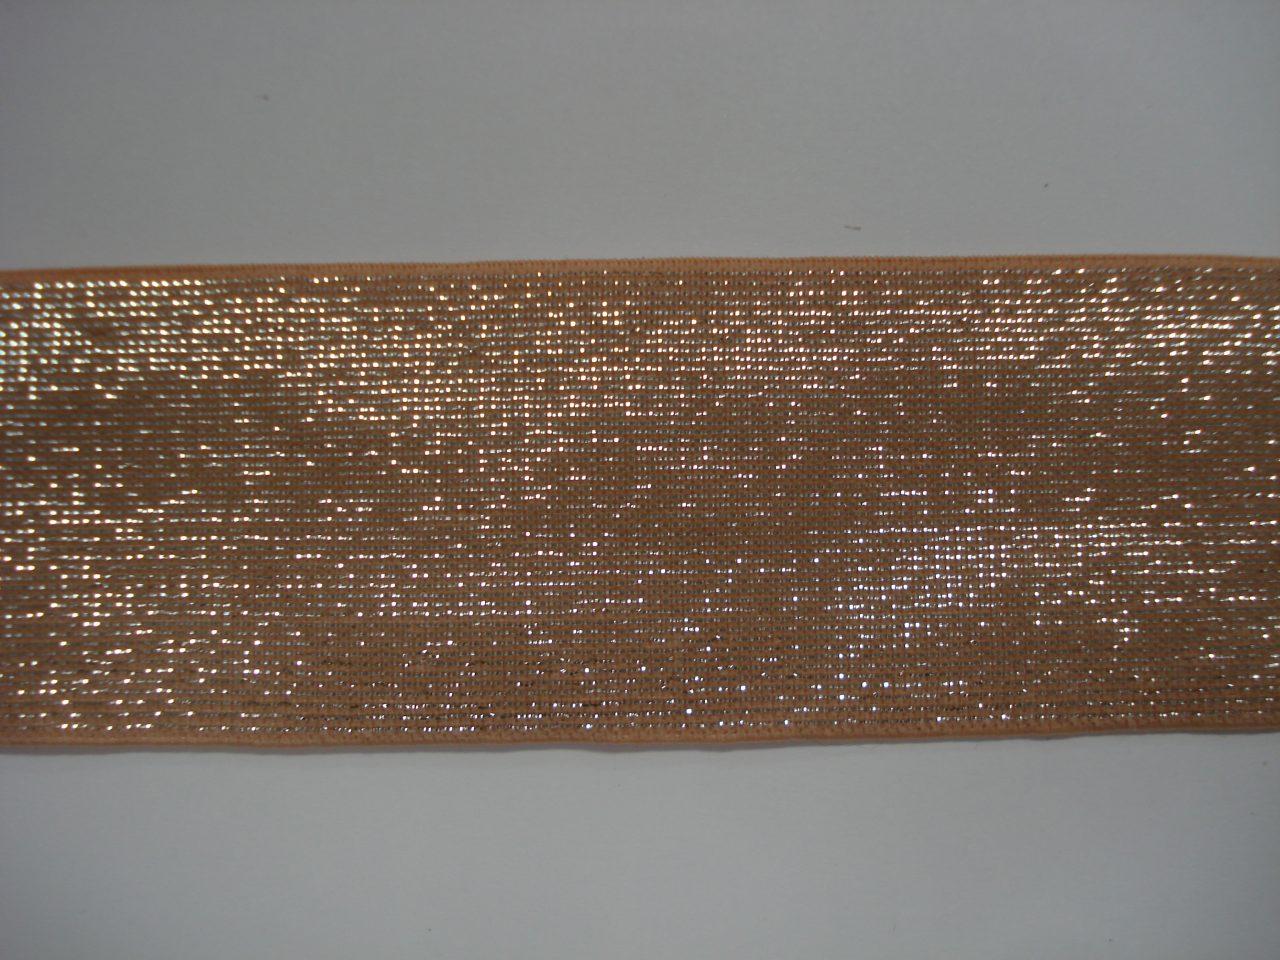 Glitter Elastiek 40mm perzik/zilver €3,50 p/m